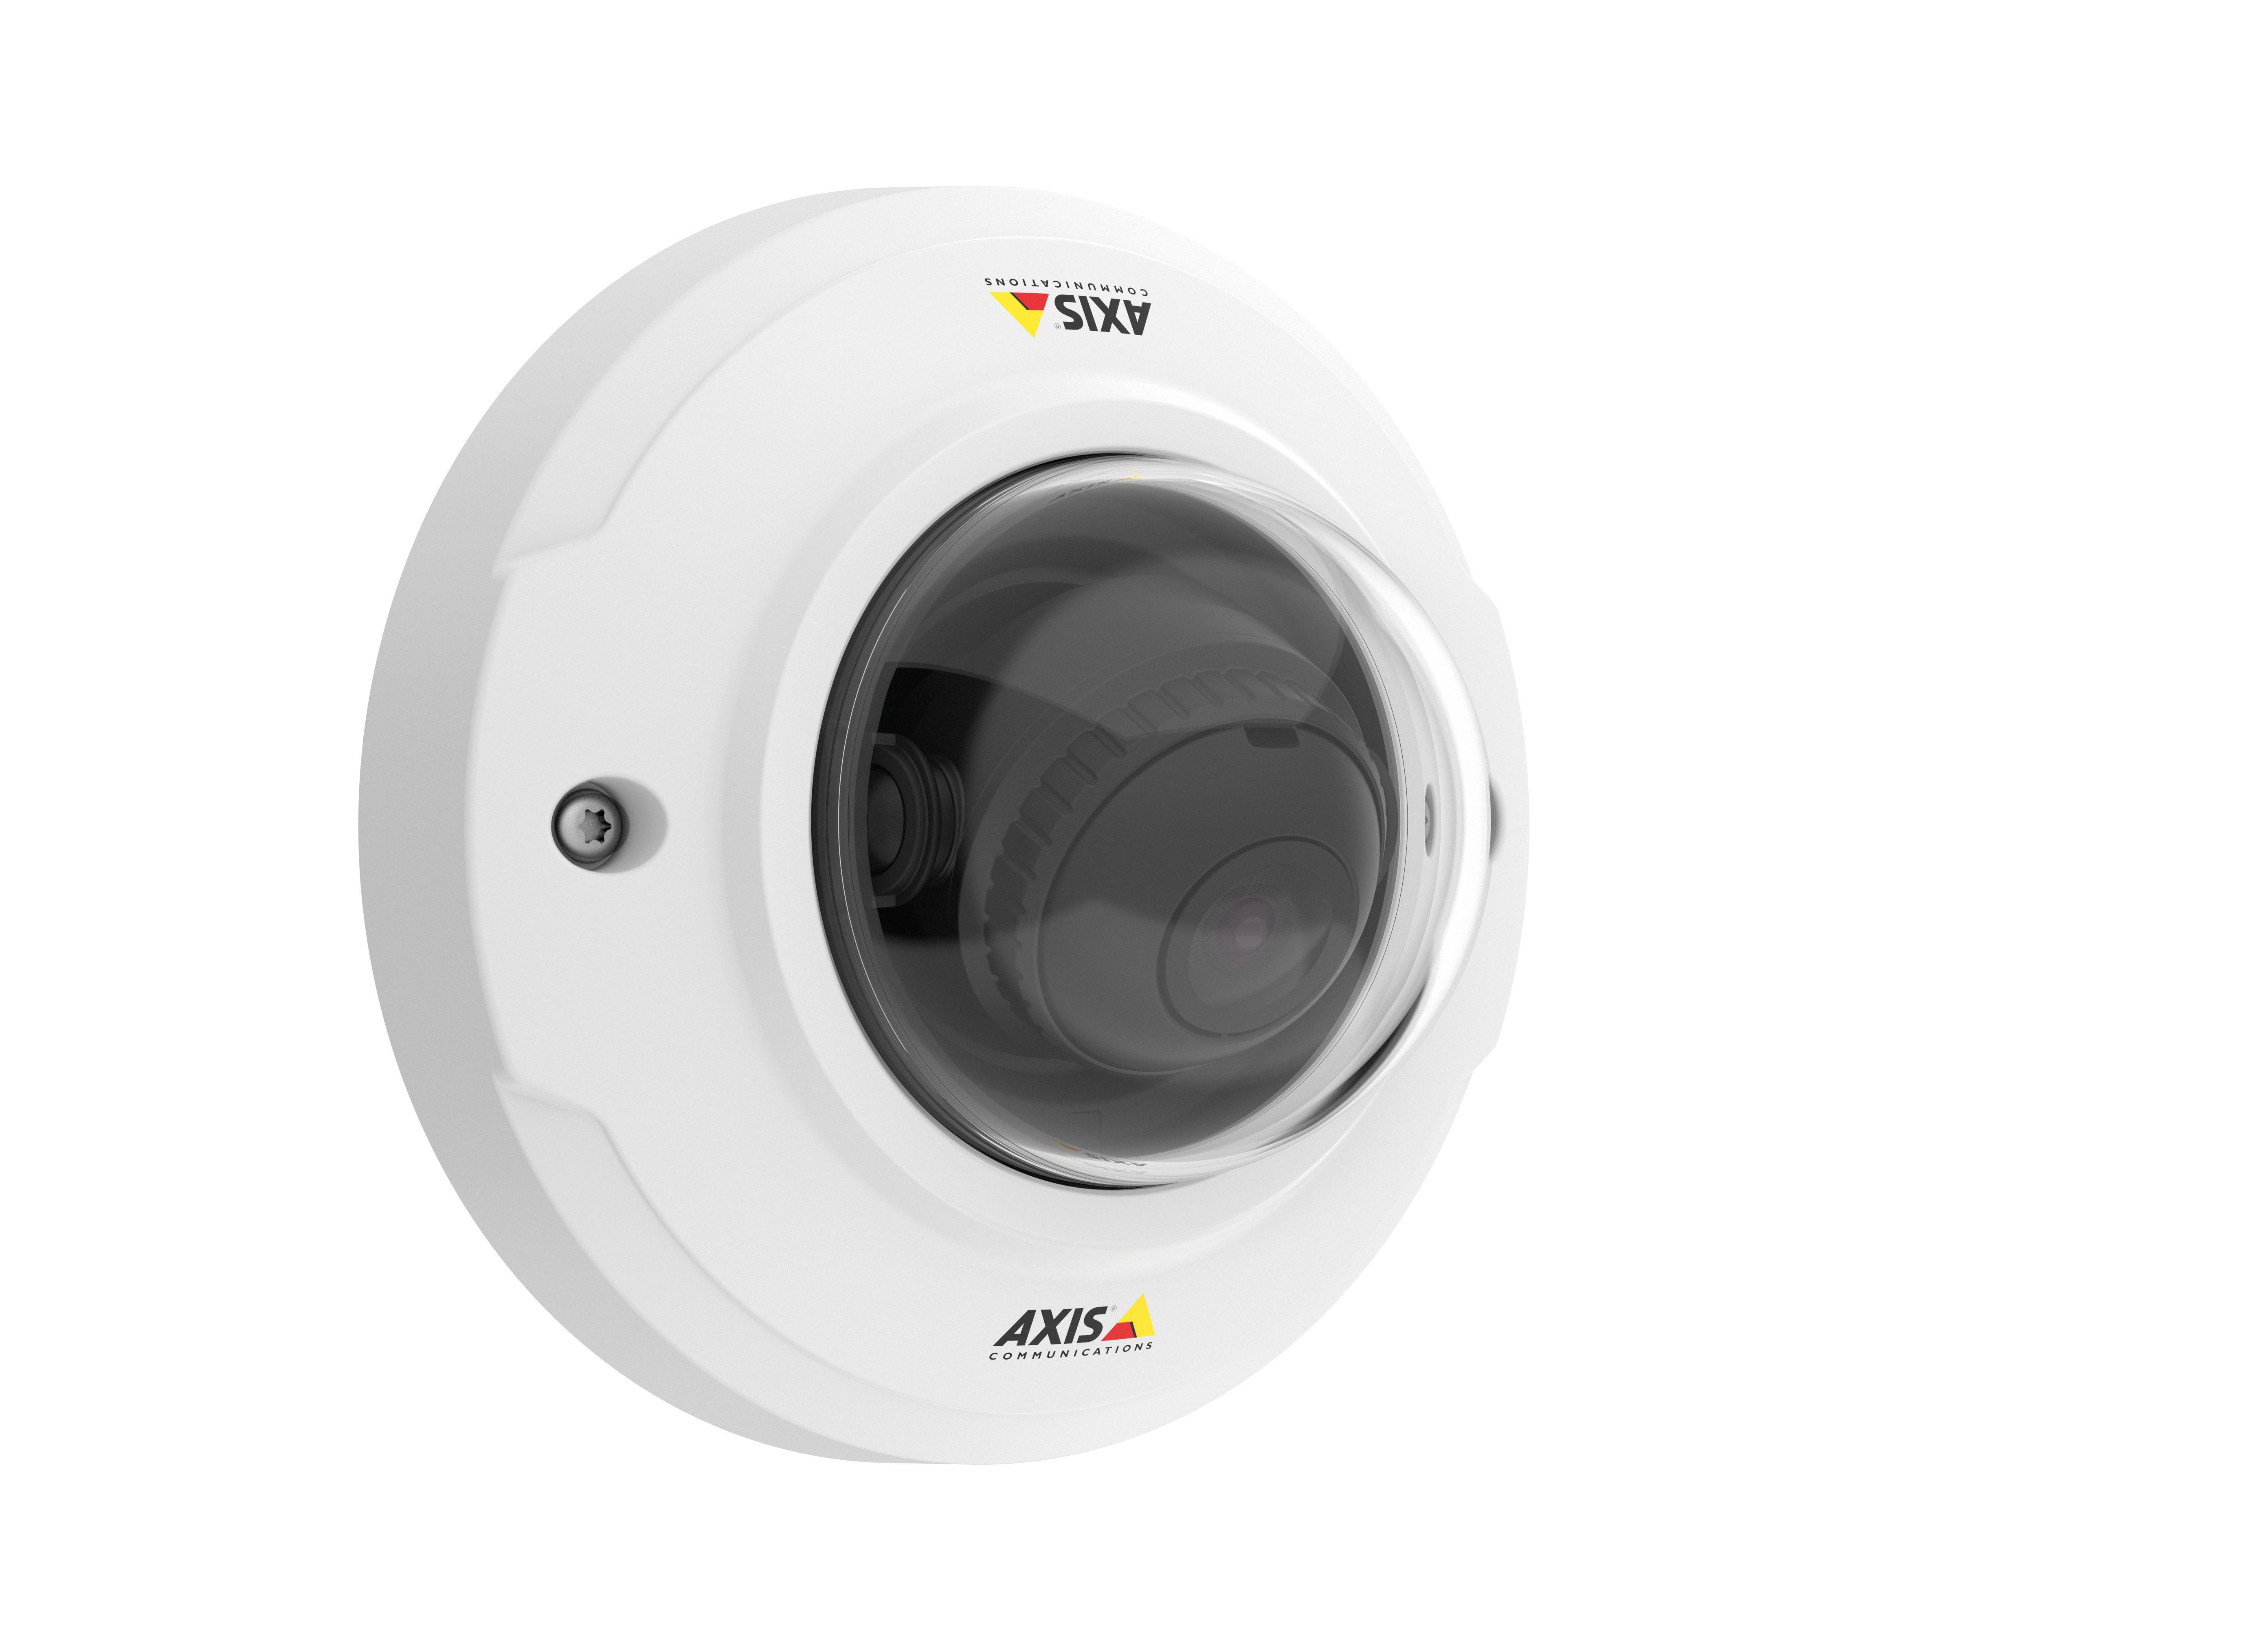 AXIS Companion Dome WV